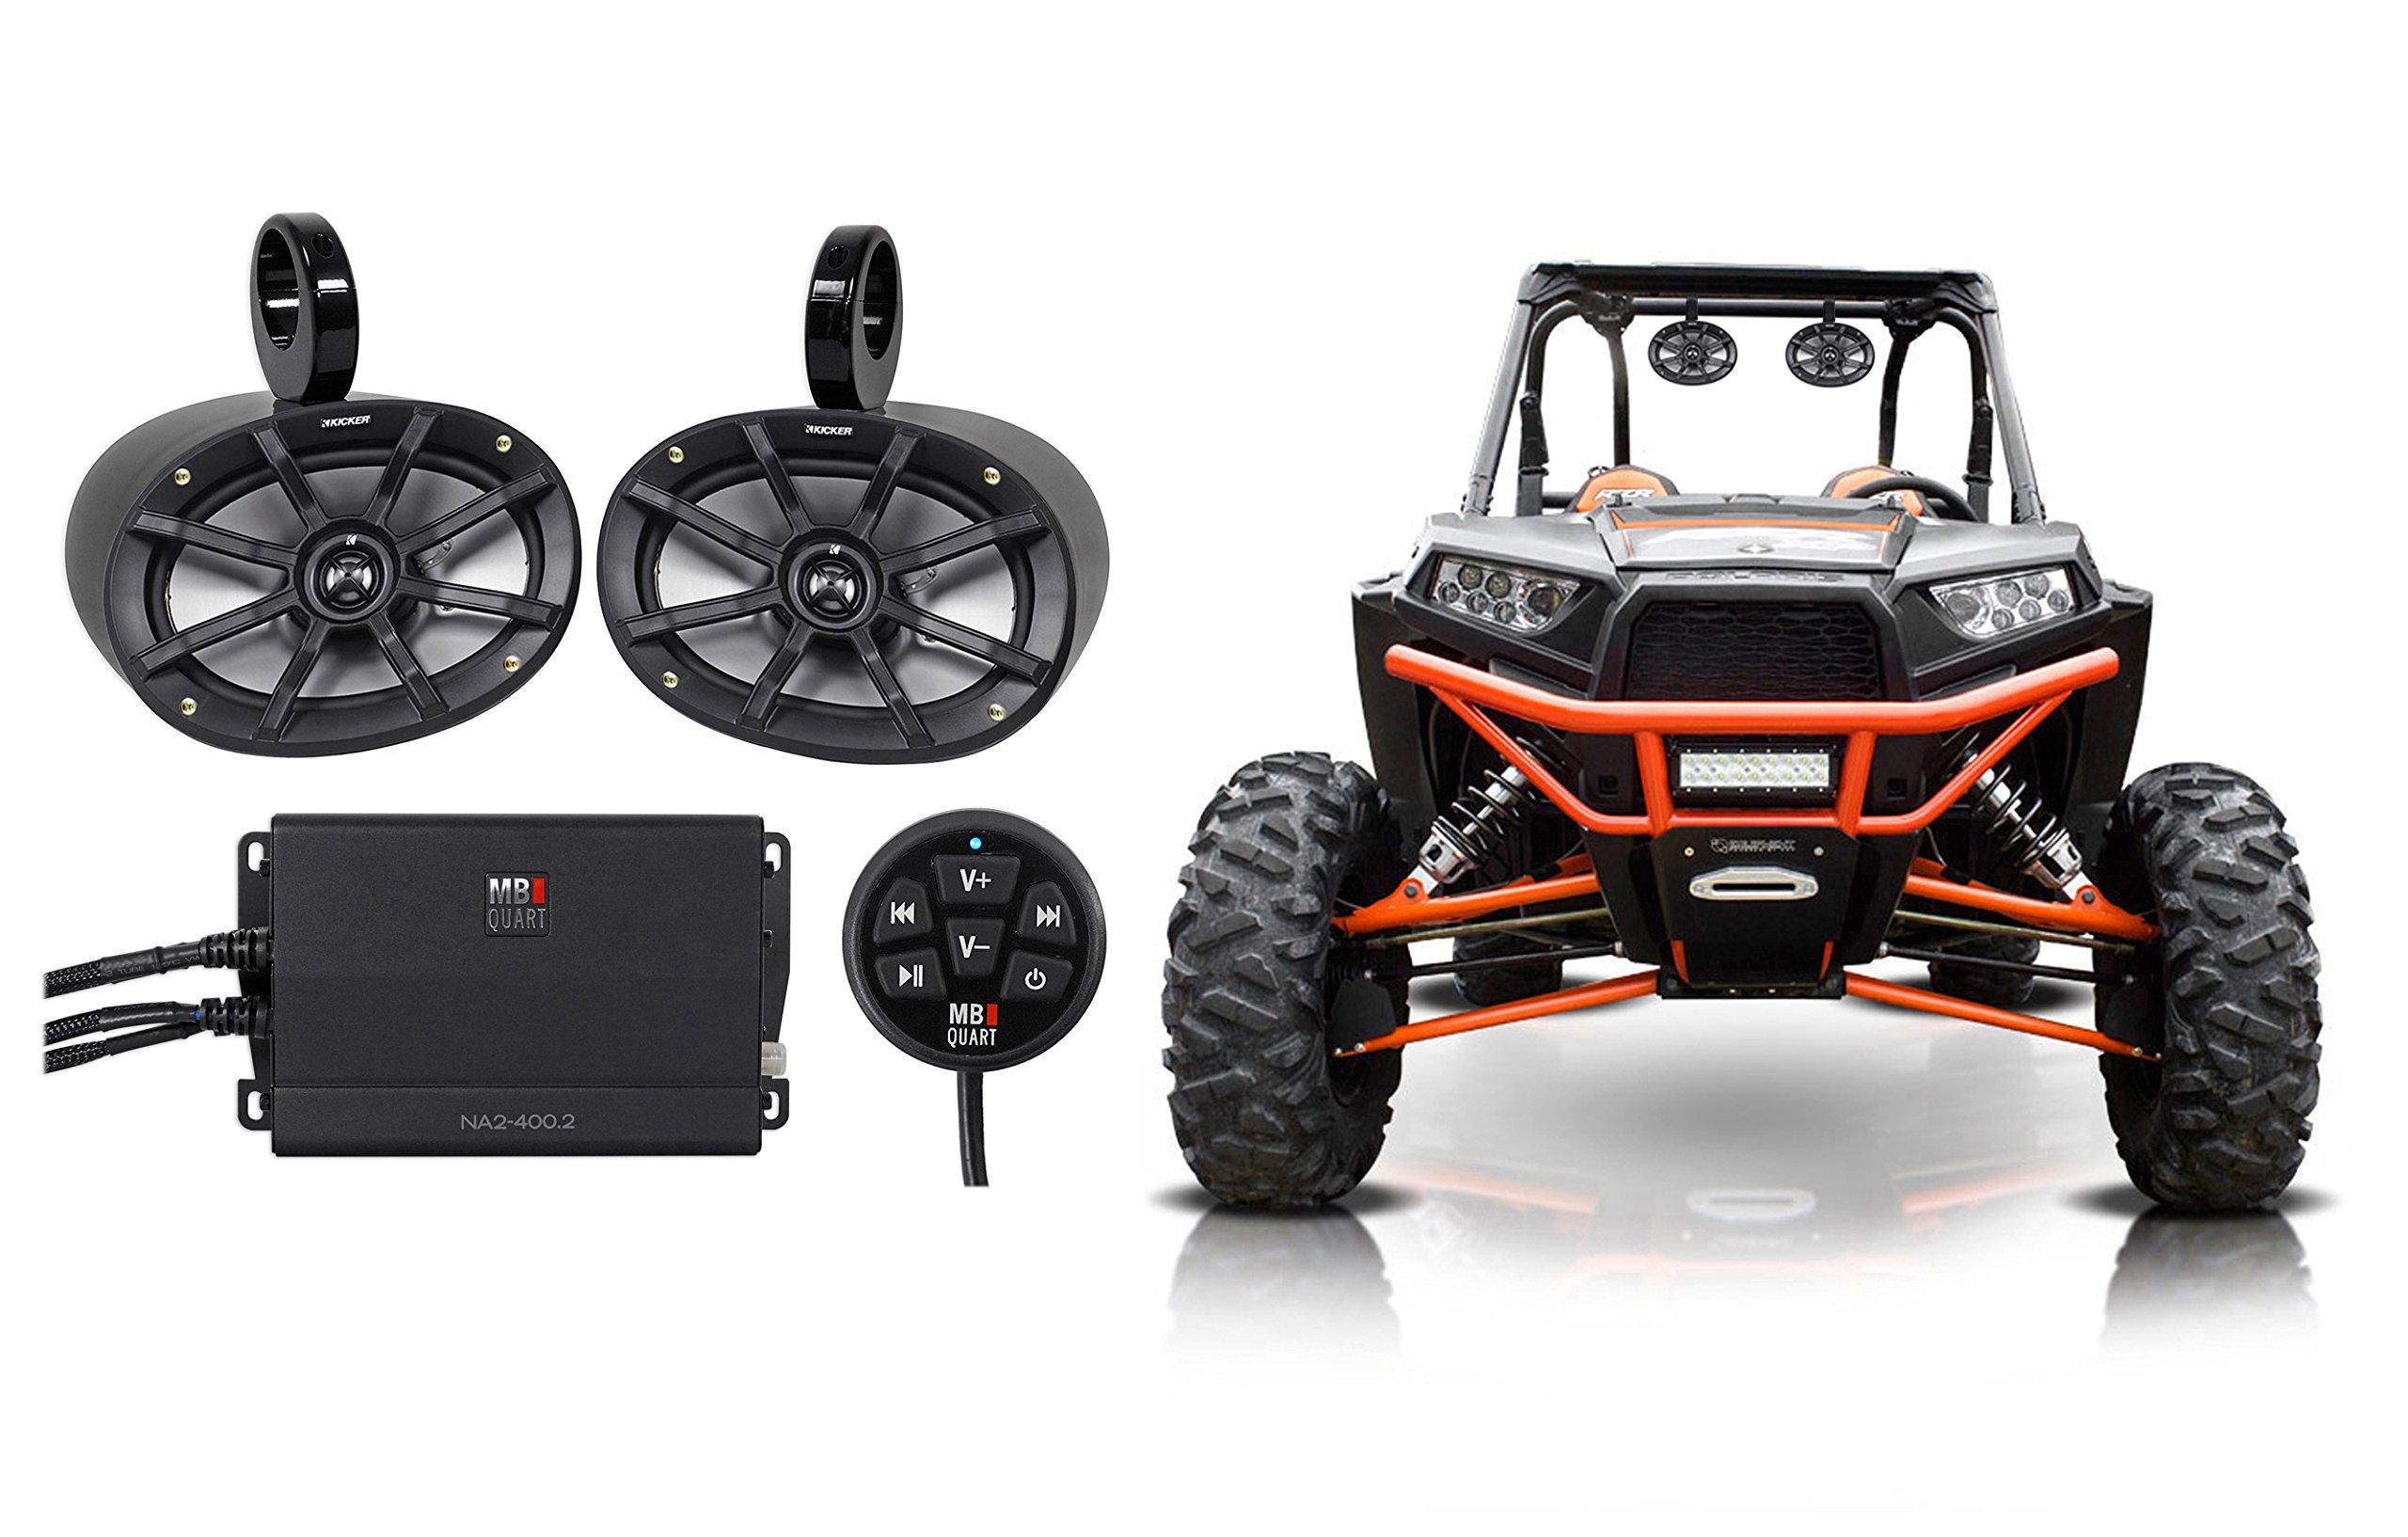 2) Kicker 6x9'' Tower Speakers+Amplifier+Bluetooth Controller Polairs RZR/ATV/UTV